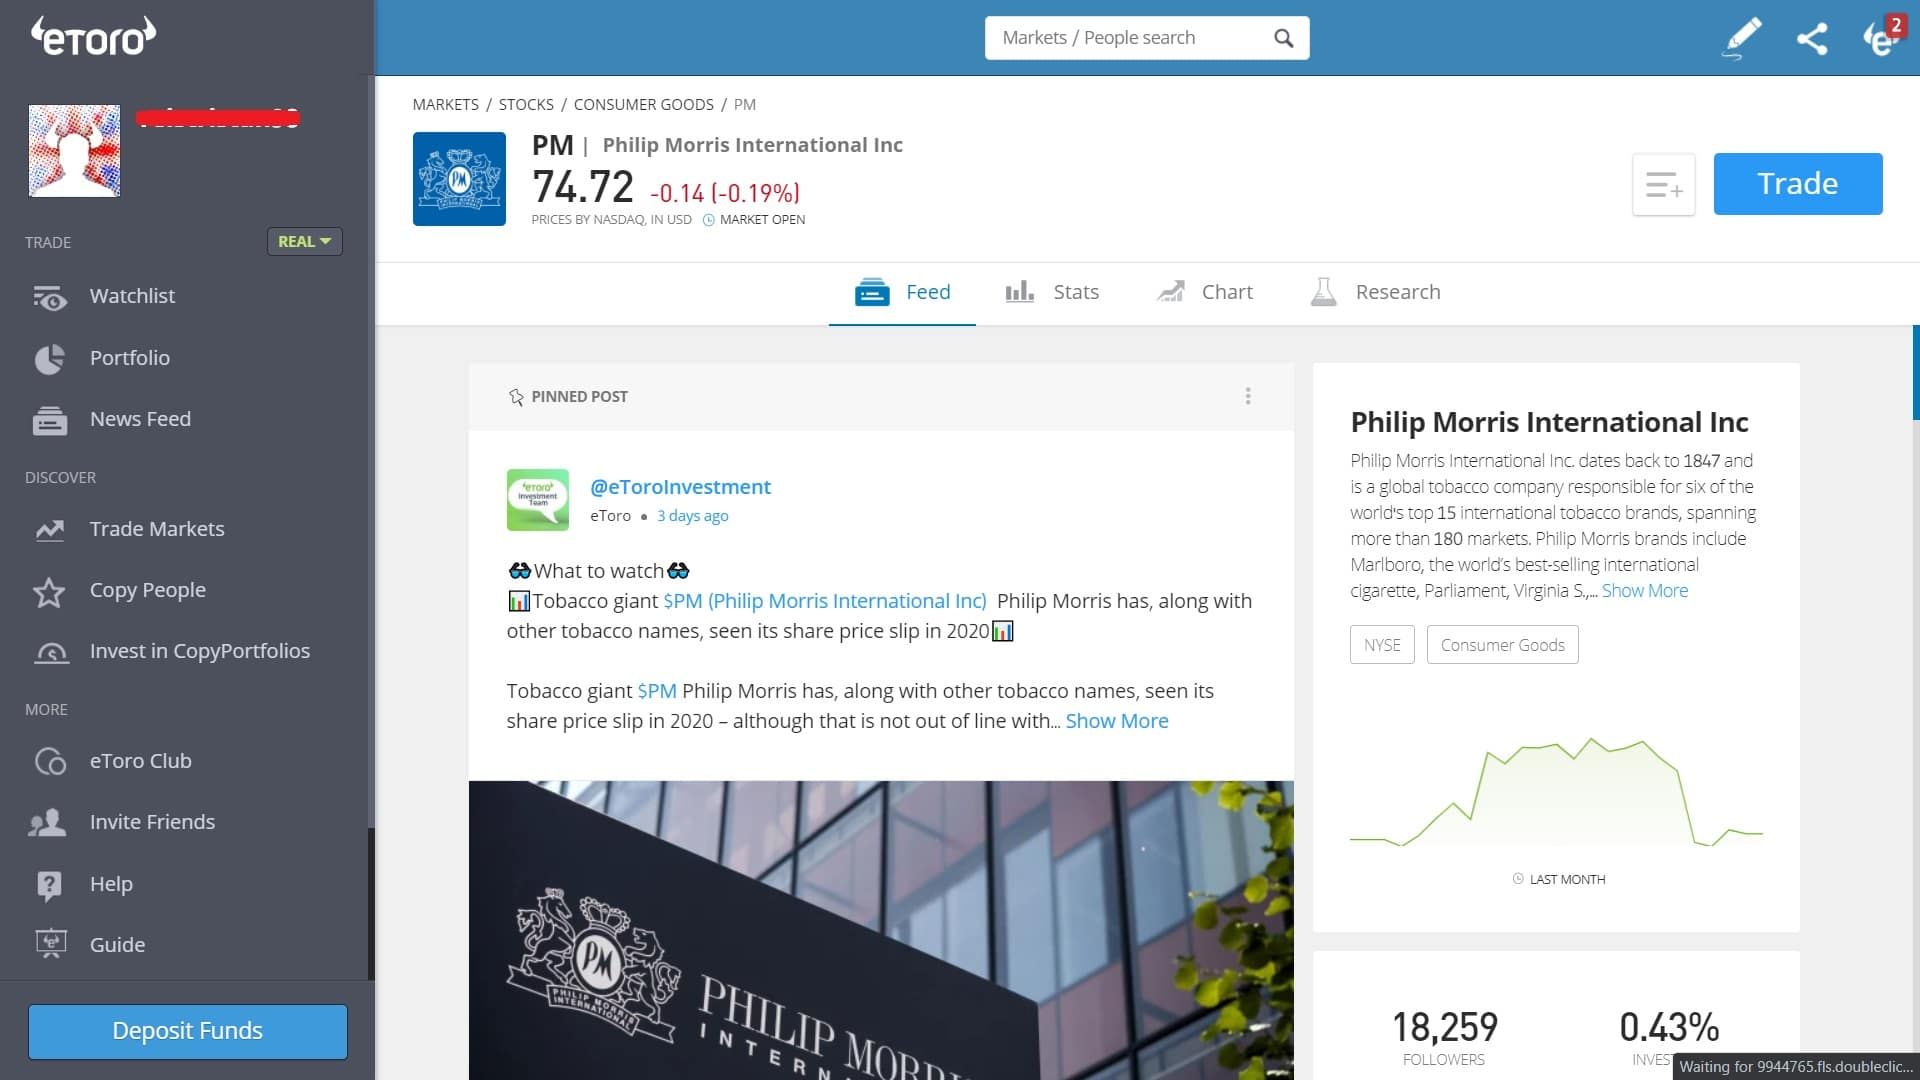 Philip Morris stock trading on eToro's platform